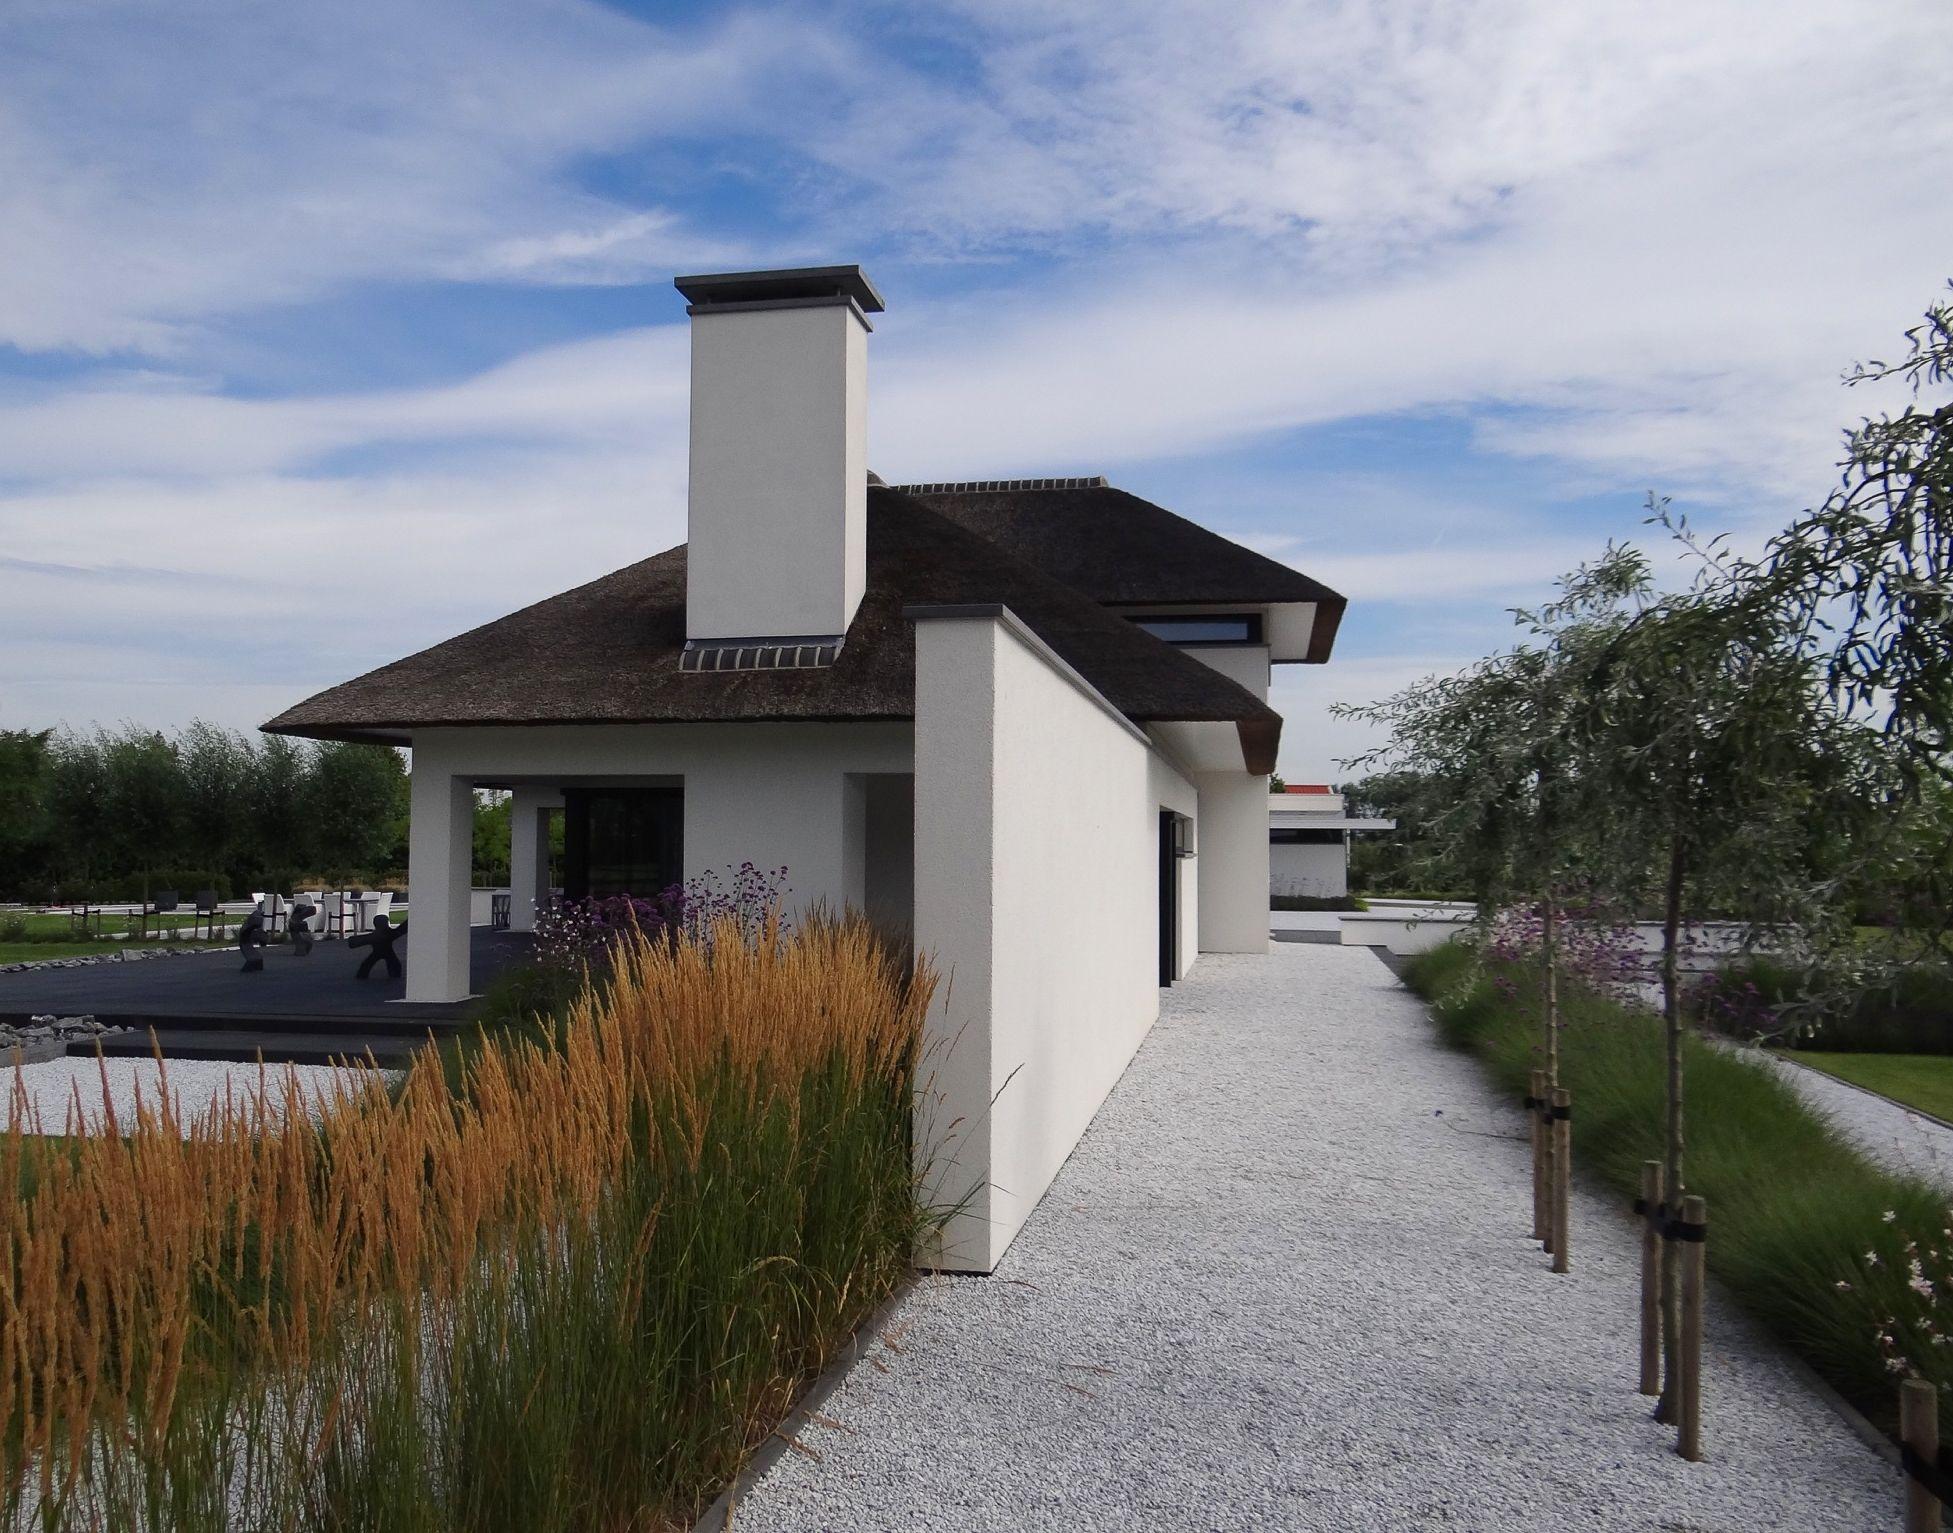 Sjaak goud architect villa yerseke nederland nieuwe fotoserie